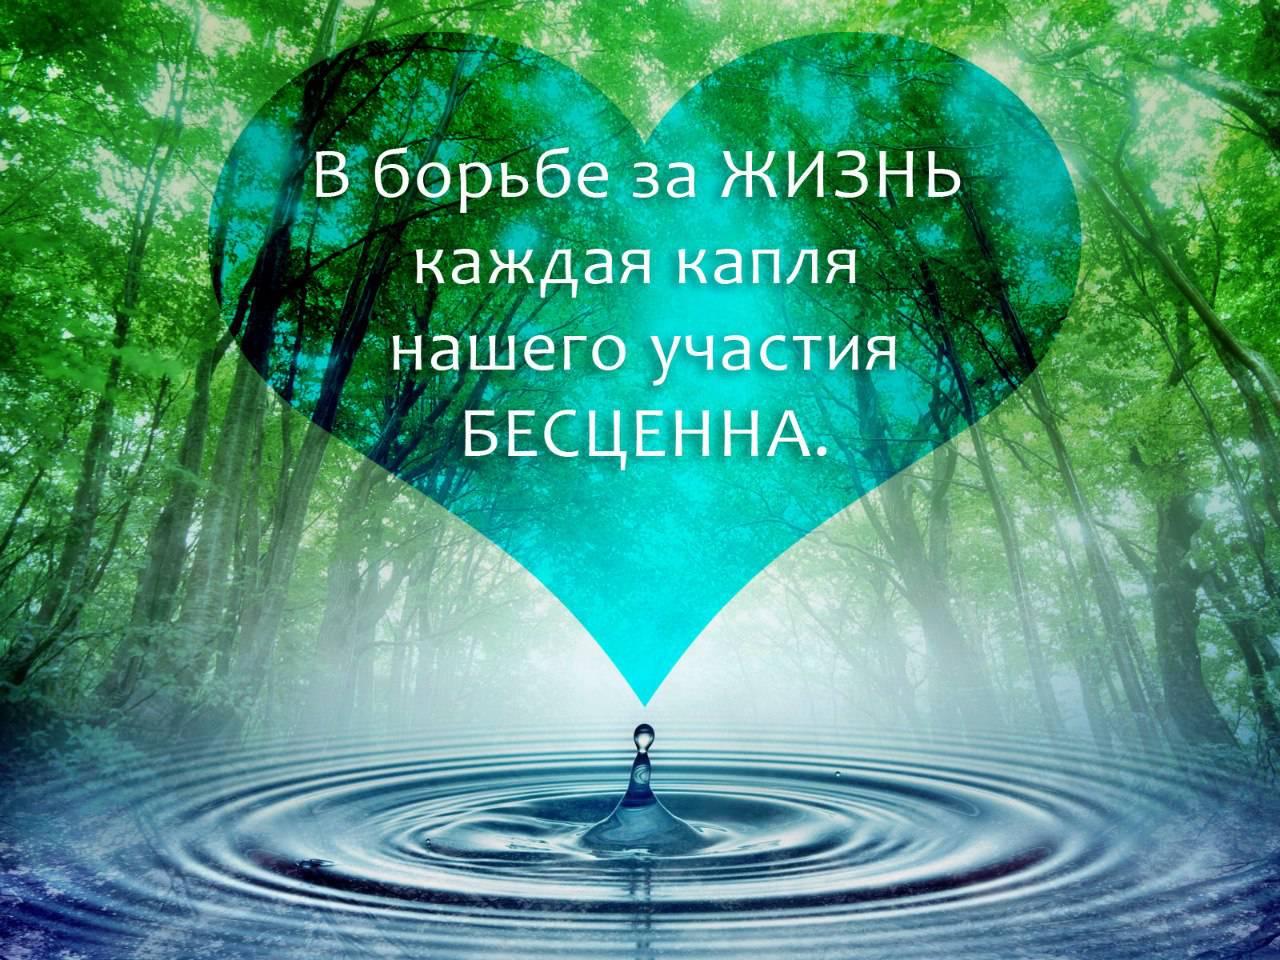 Открытка «Наша жизнь, наша музыка» 61